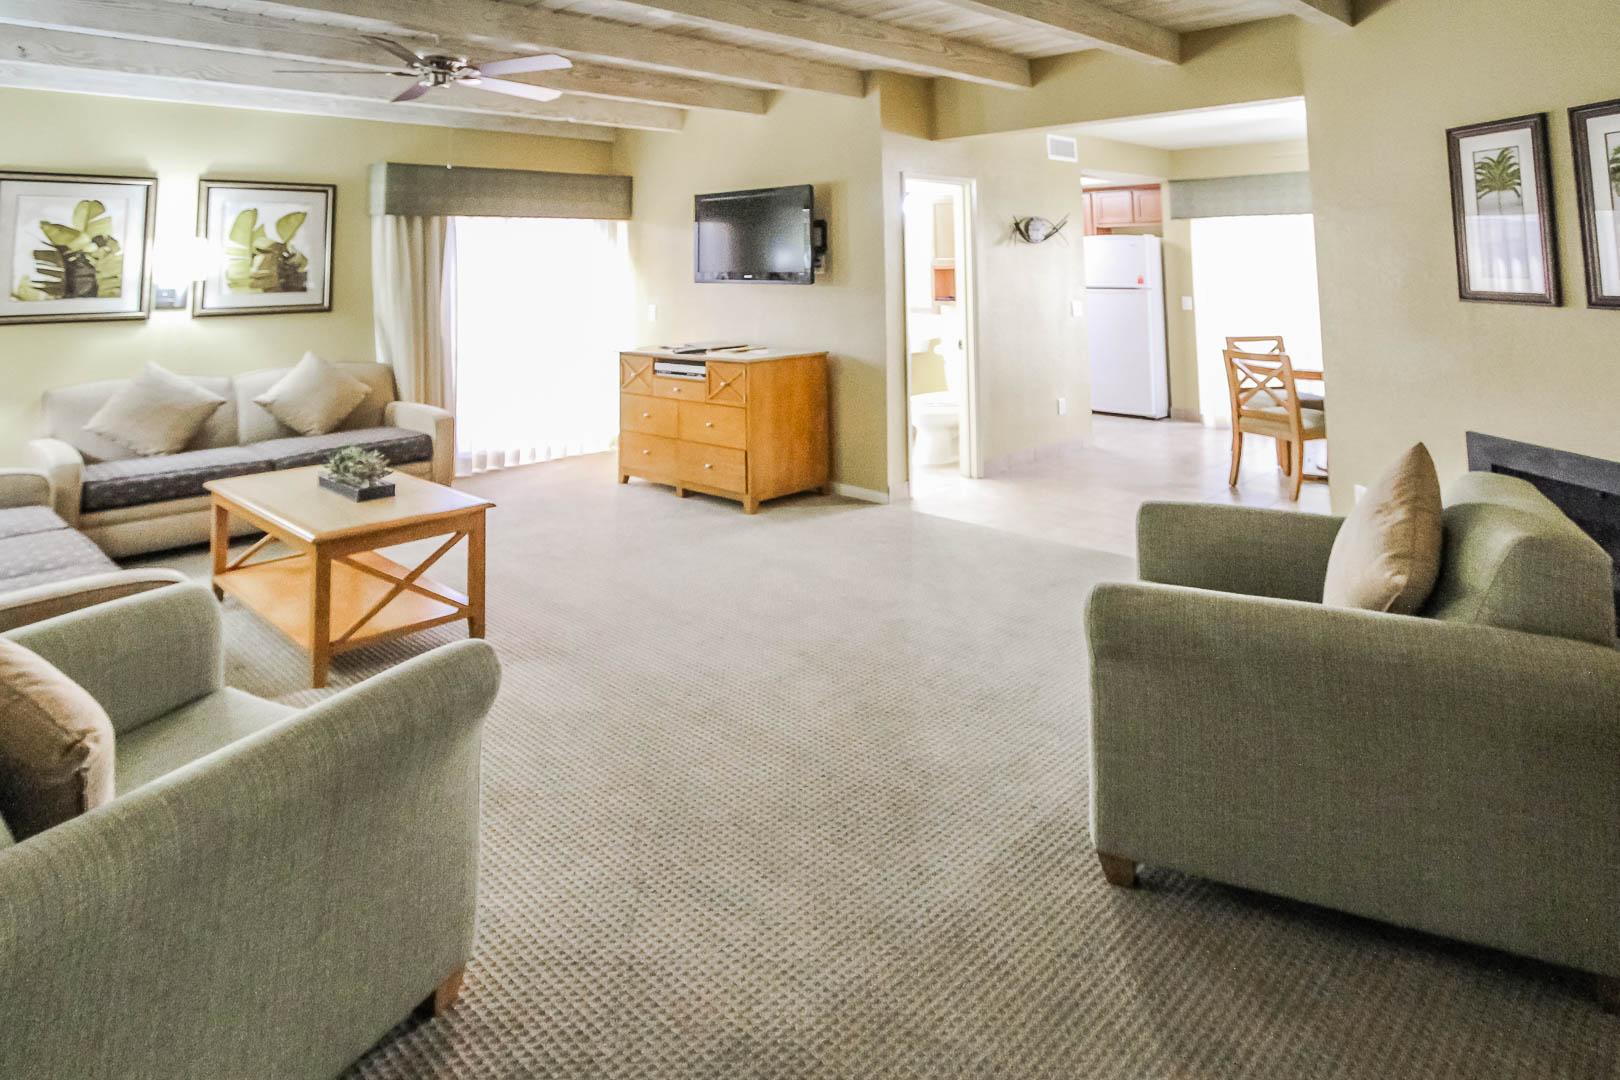 Spacious living room area at VRI's Desert Isle Resort in California.